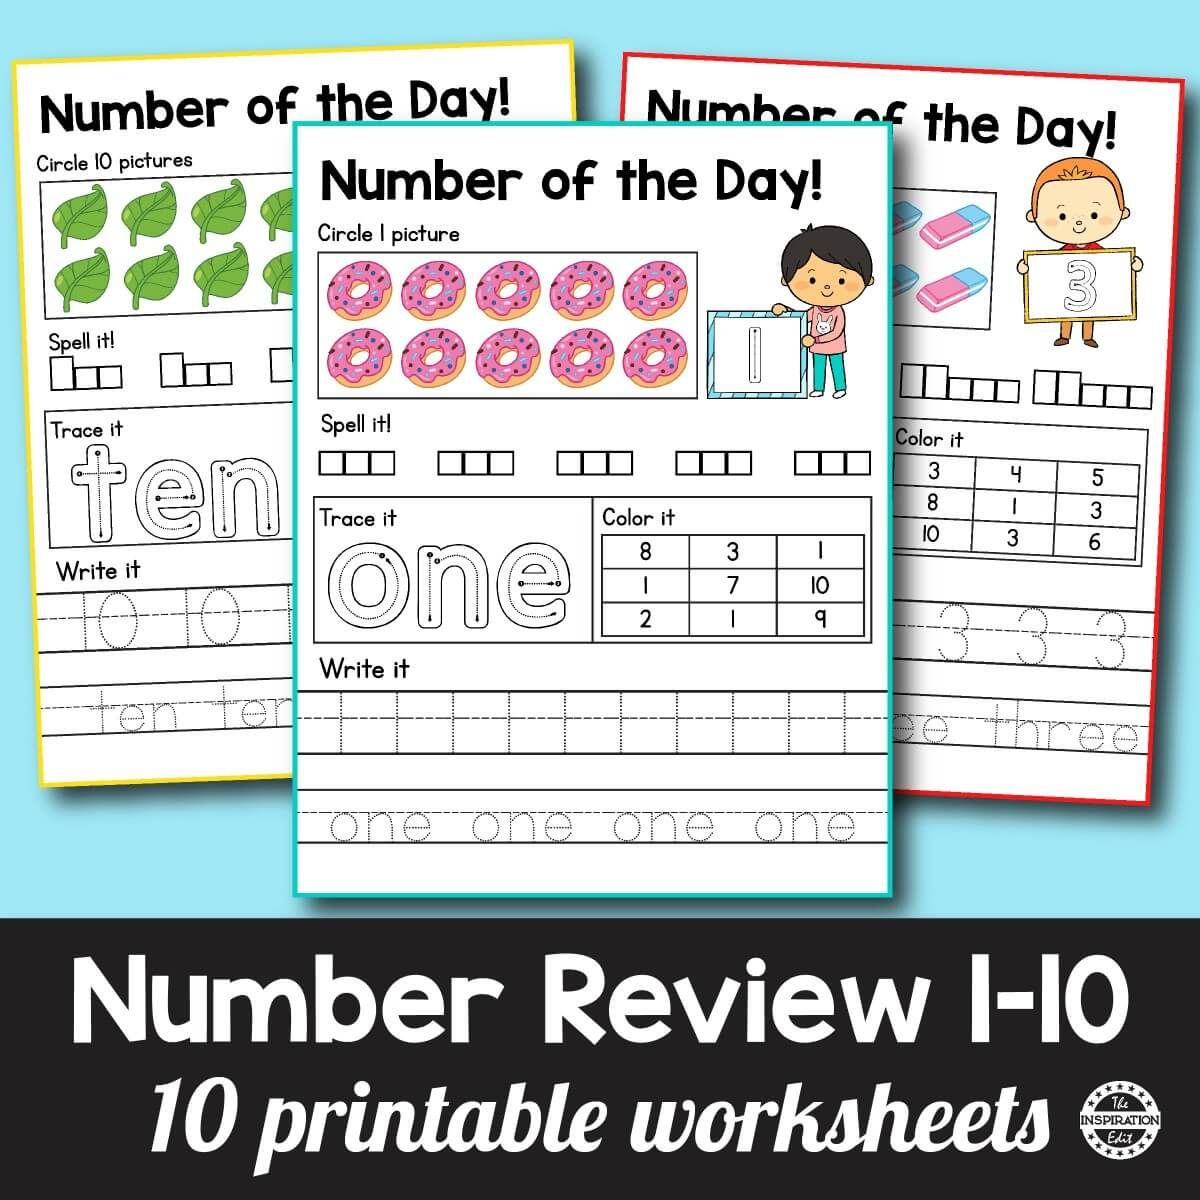 Fantastic Number Of The Day Preschool Worksheets